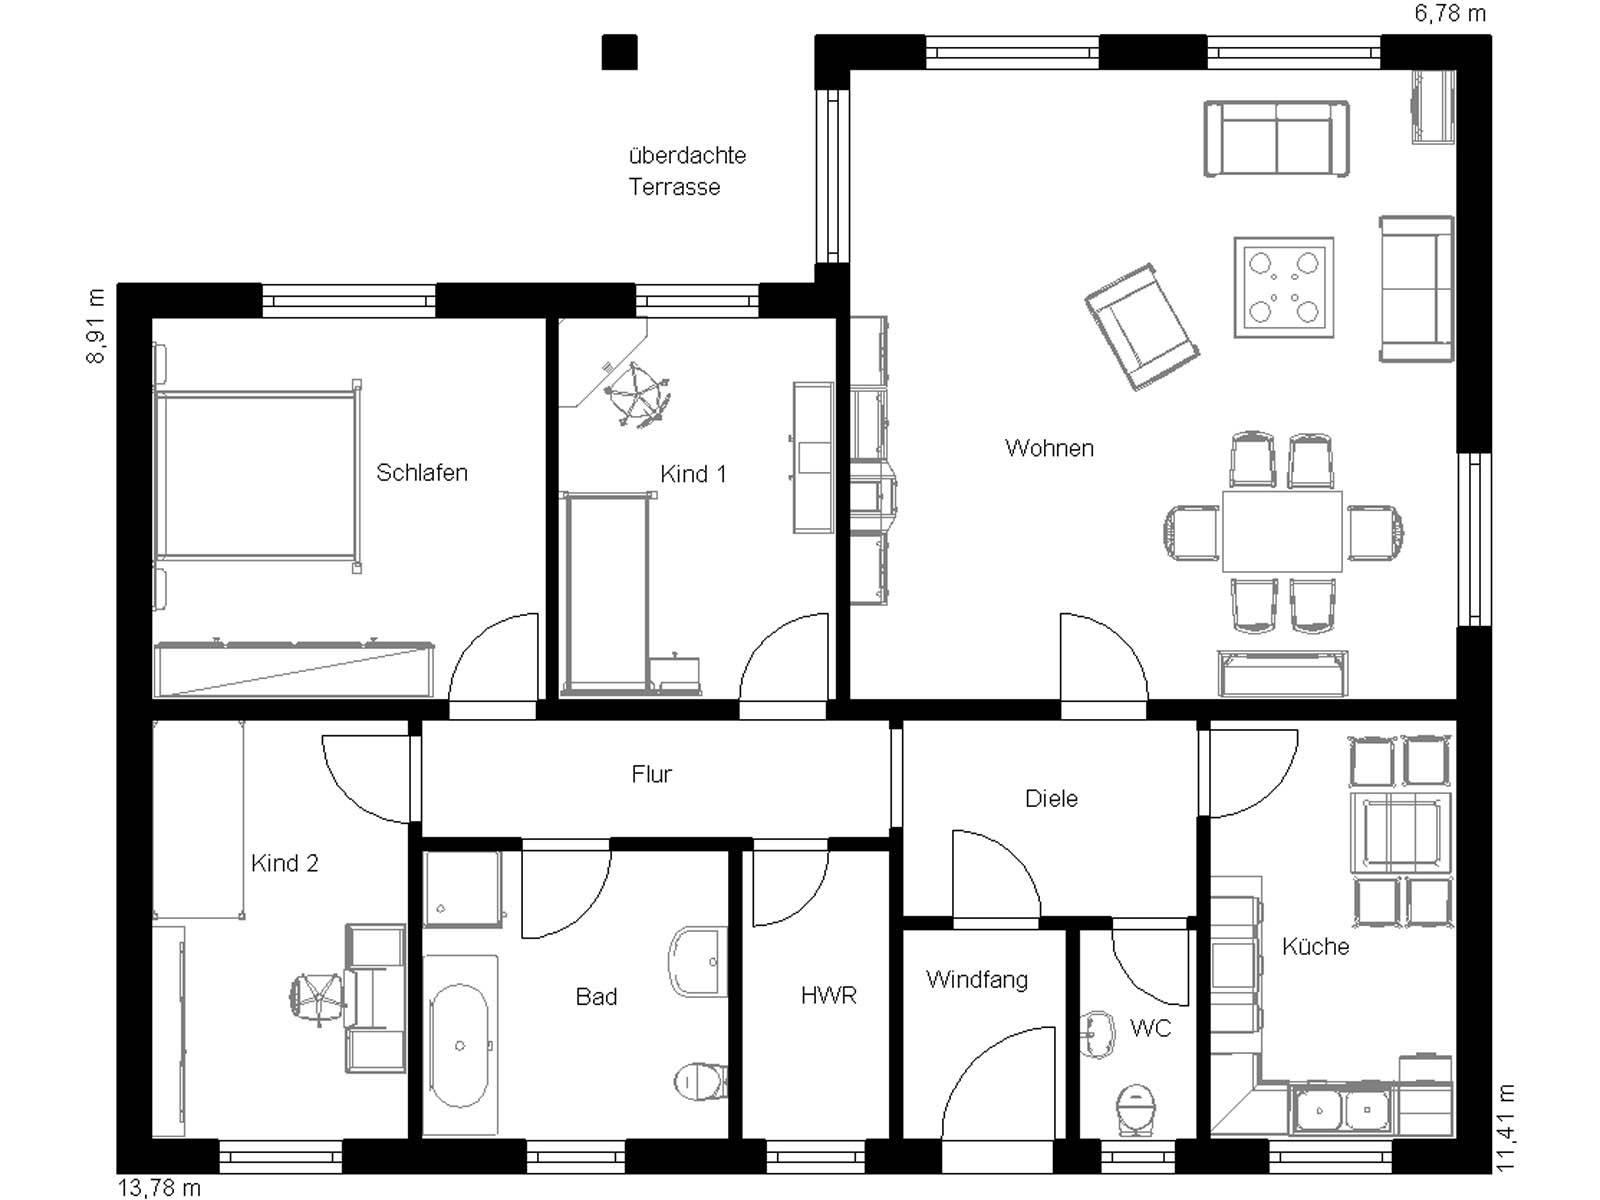 Walmdach bungalow 120 domoplan massivhaus for Bungalow grundrisse